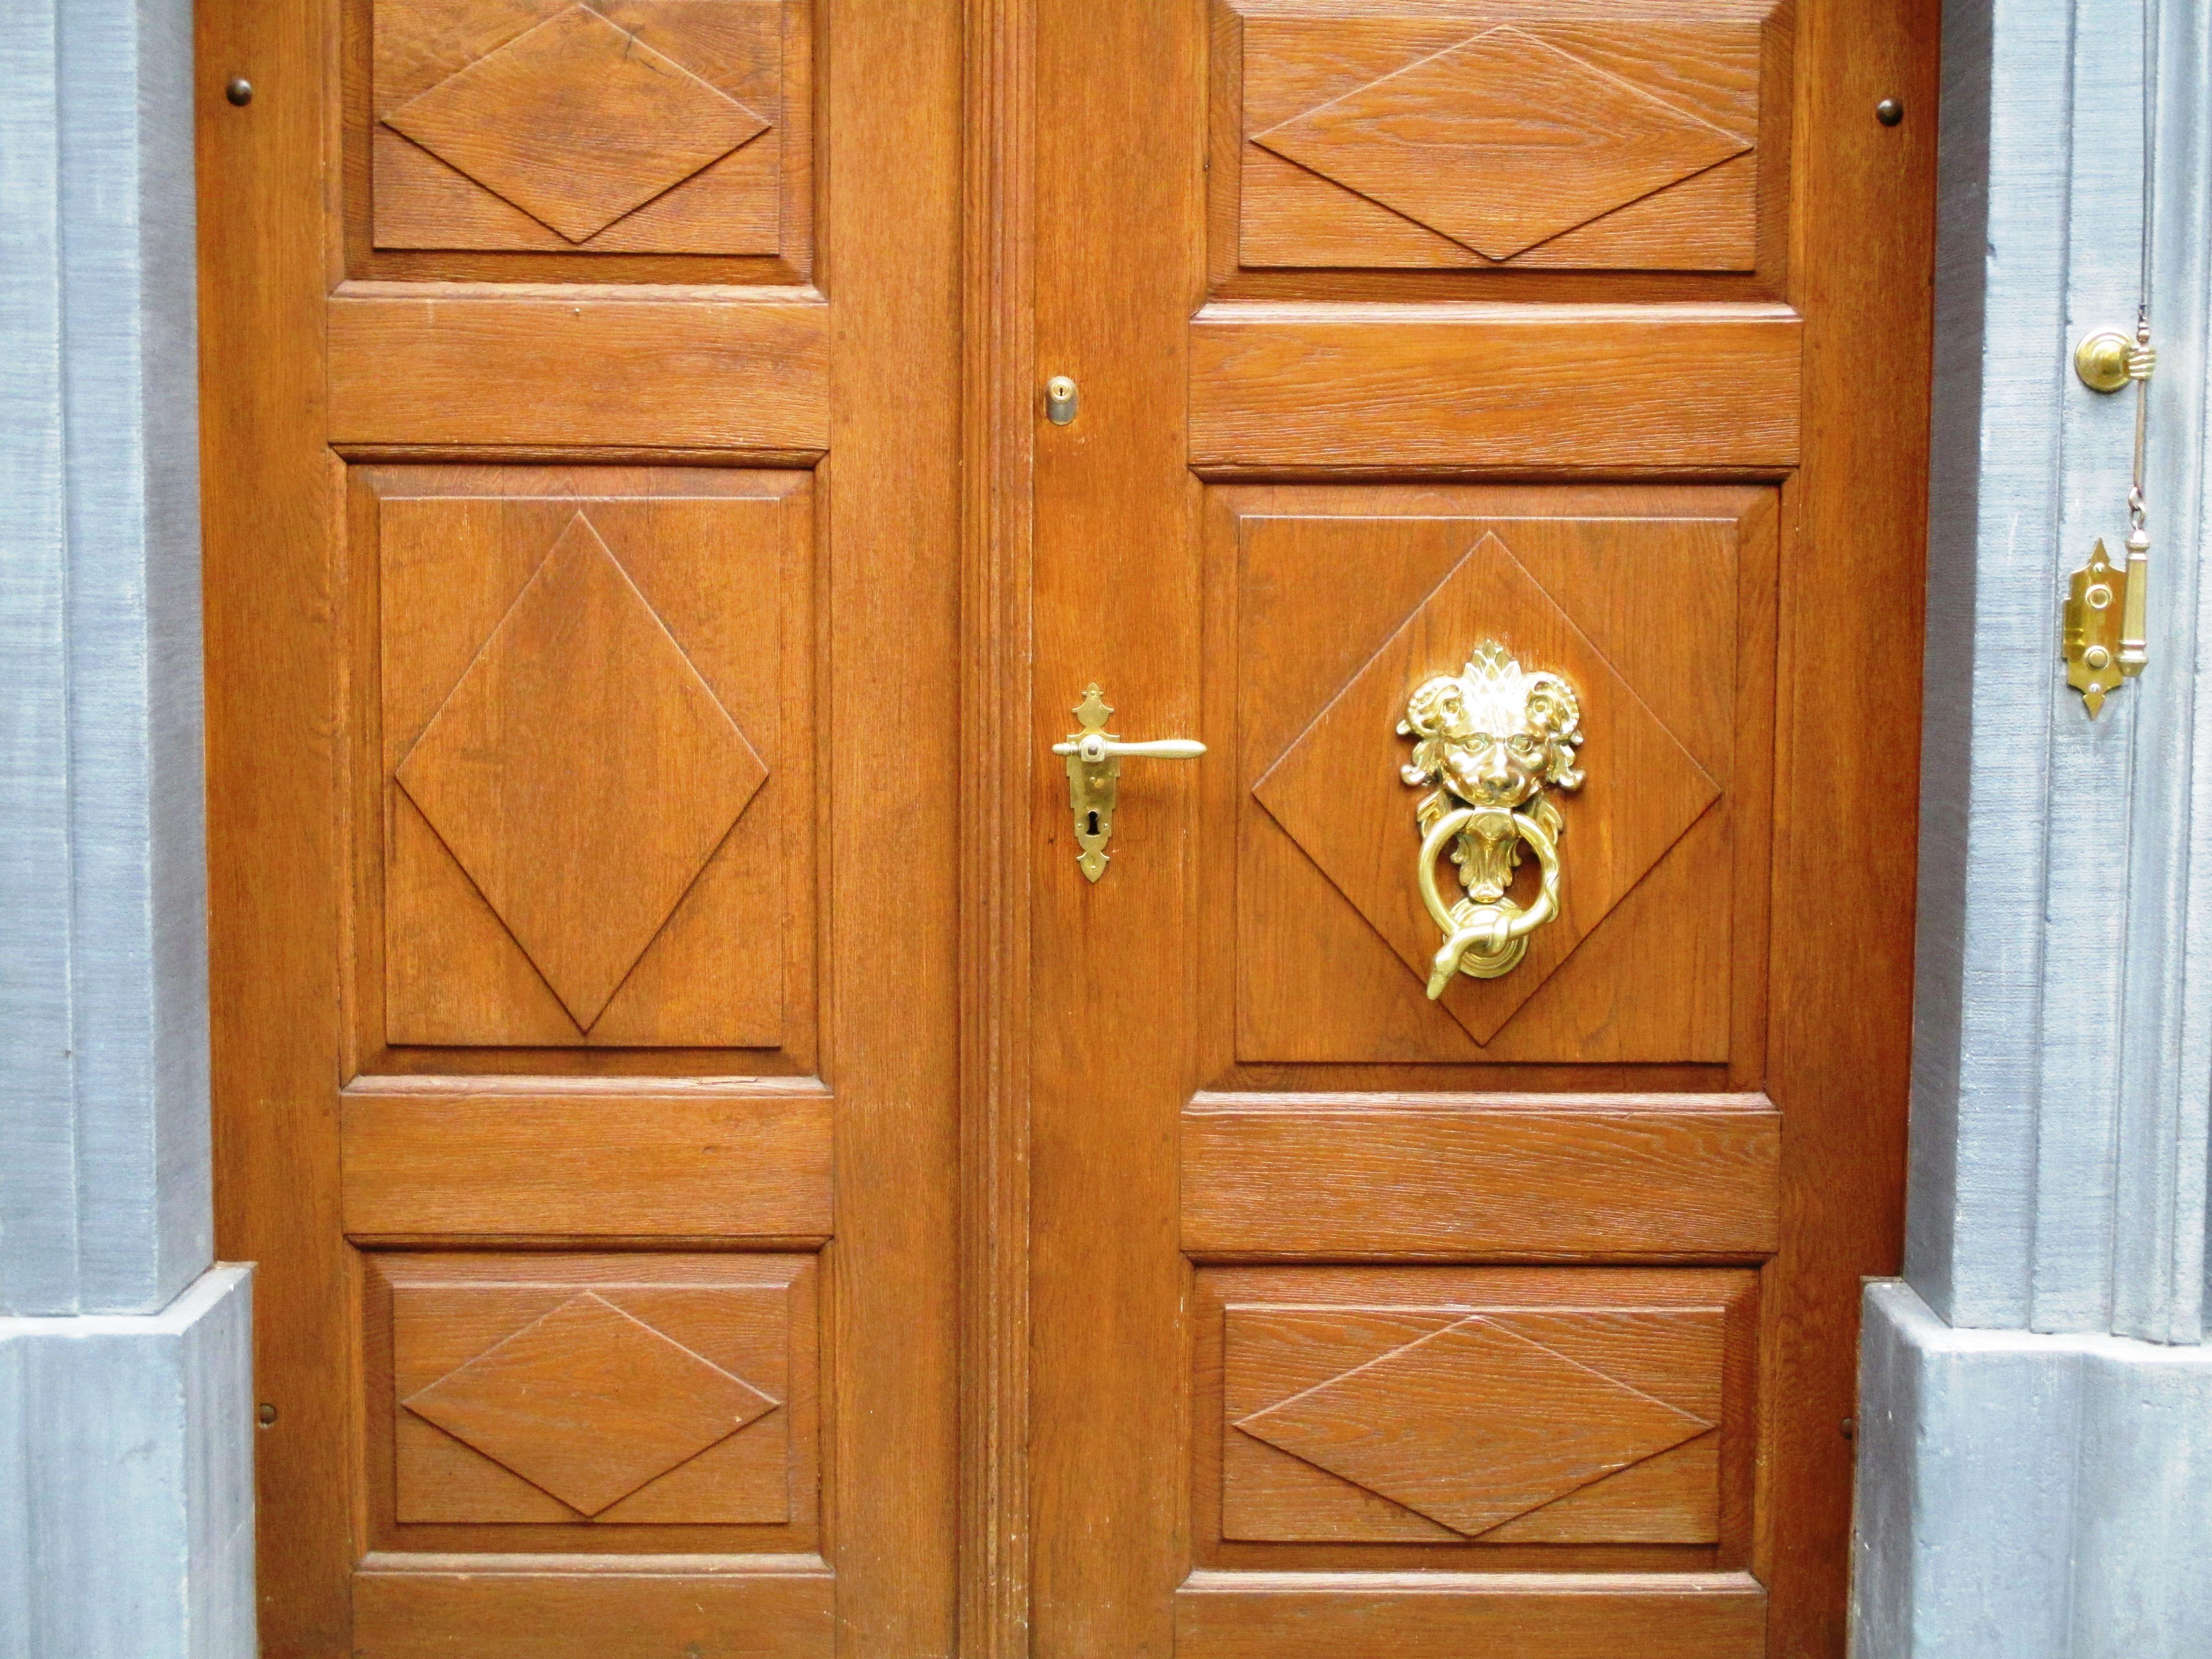 free images floor window pattern frame furniture art hardwood switzerland house entrance cupboard noble stylish door handle